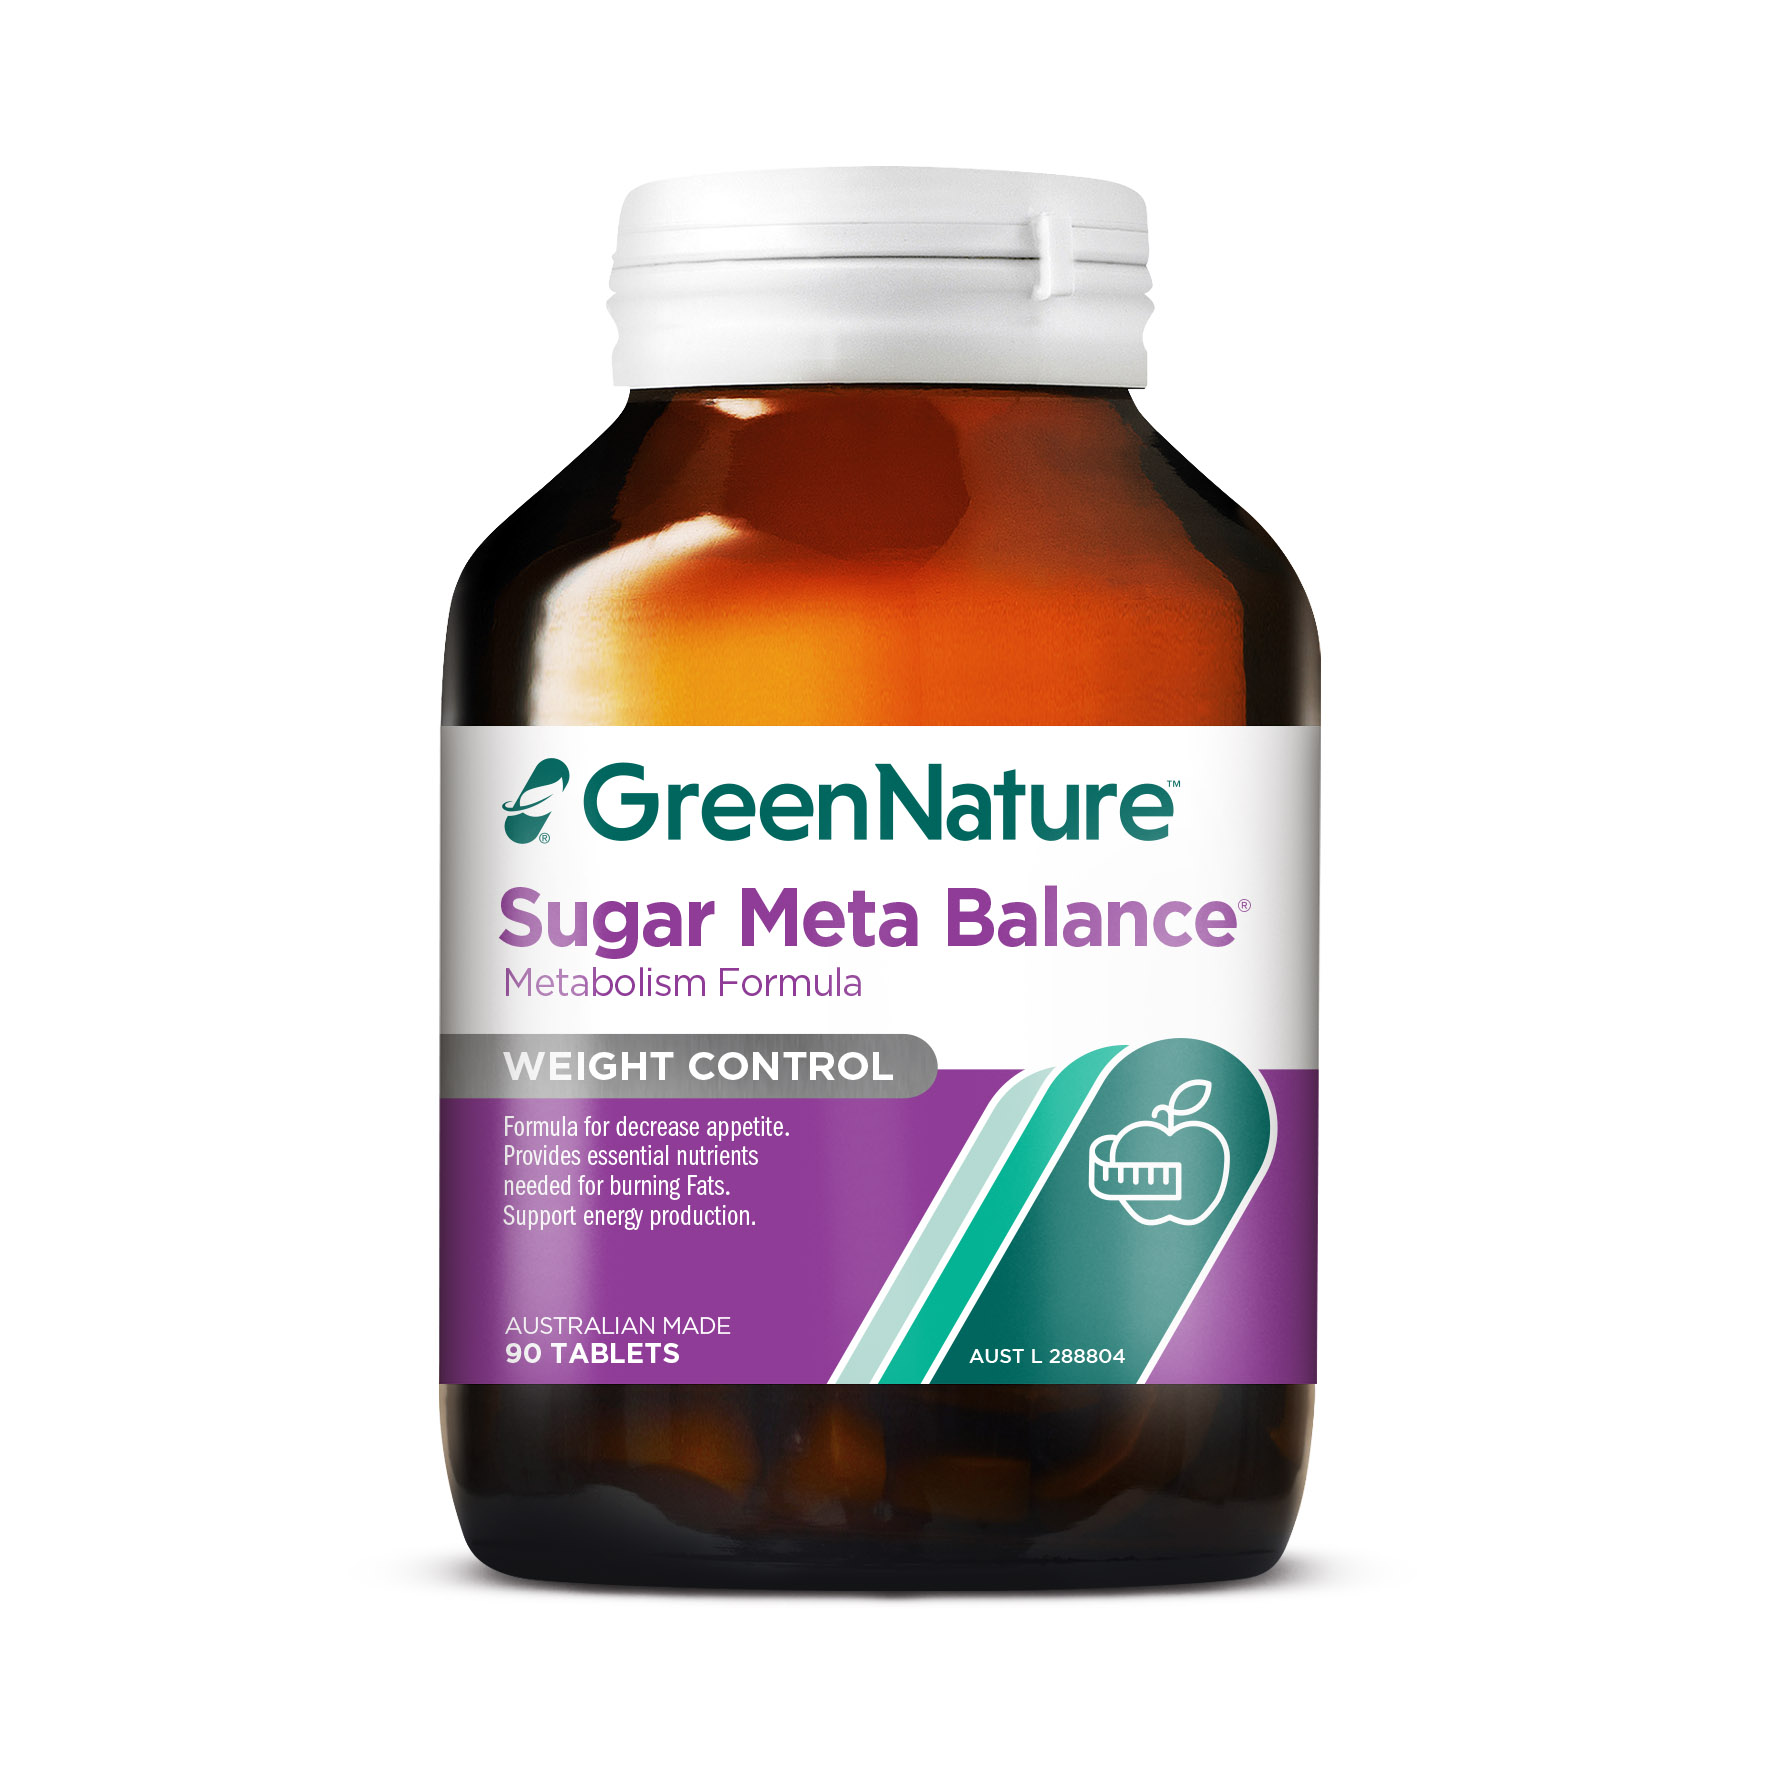 SugerMetaBalance-greennature